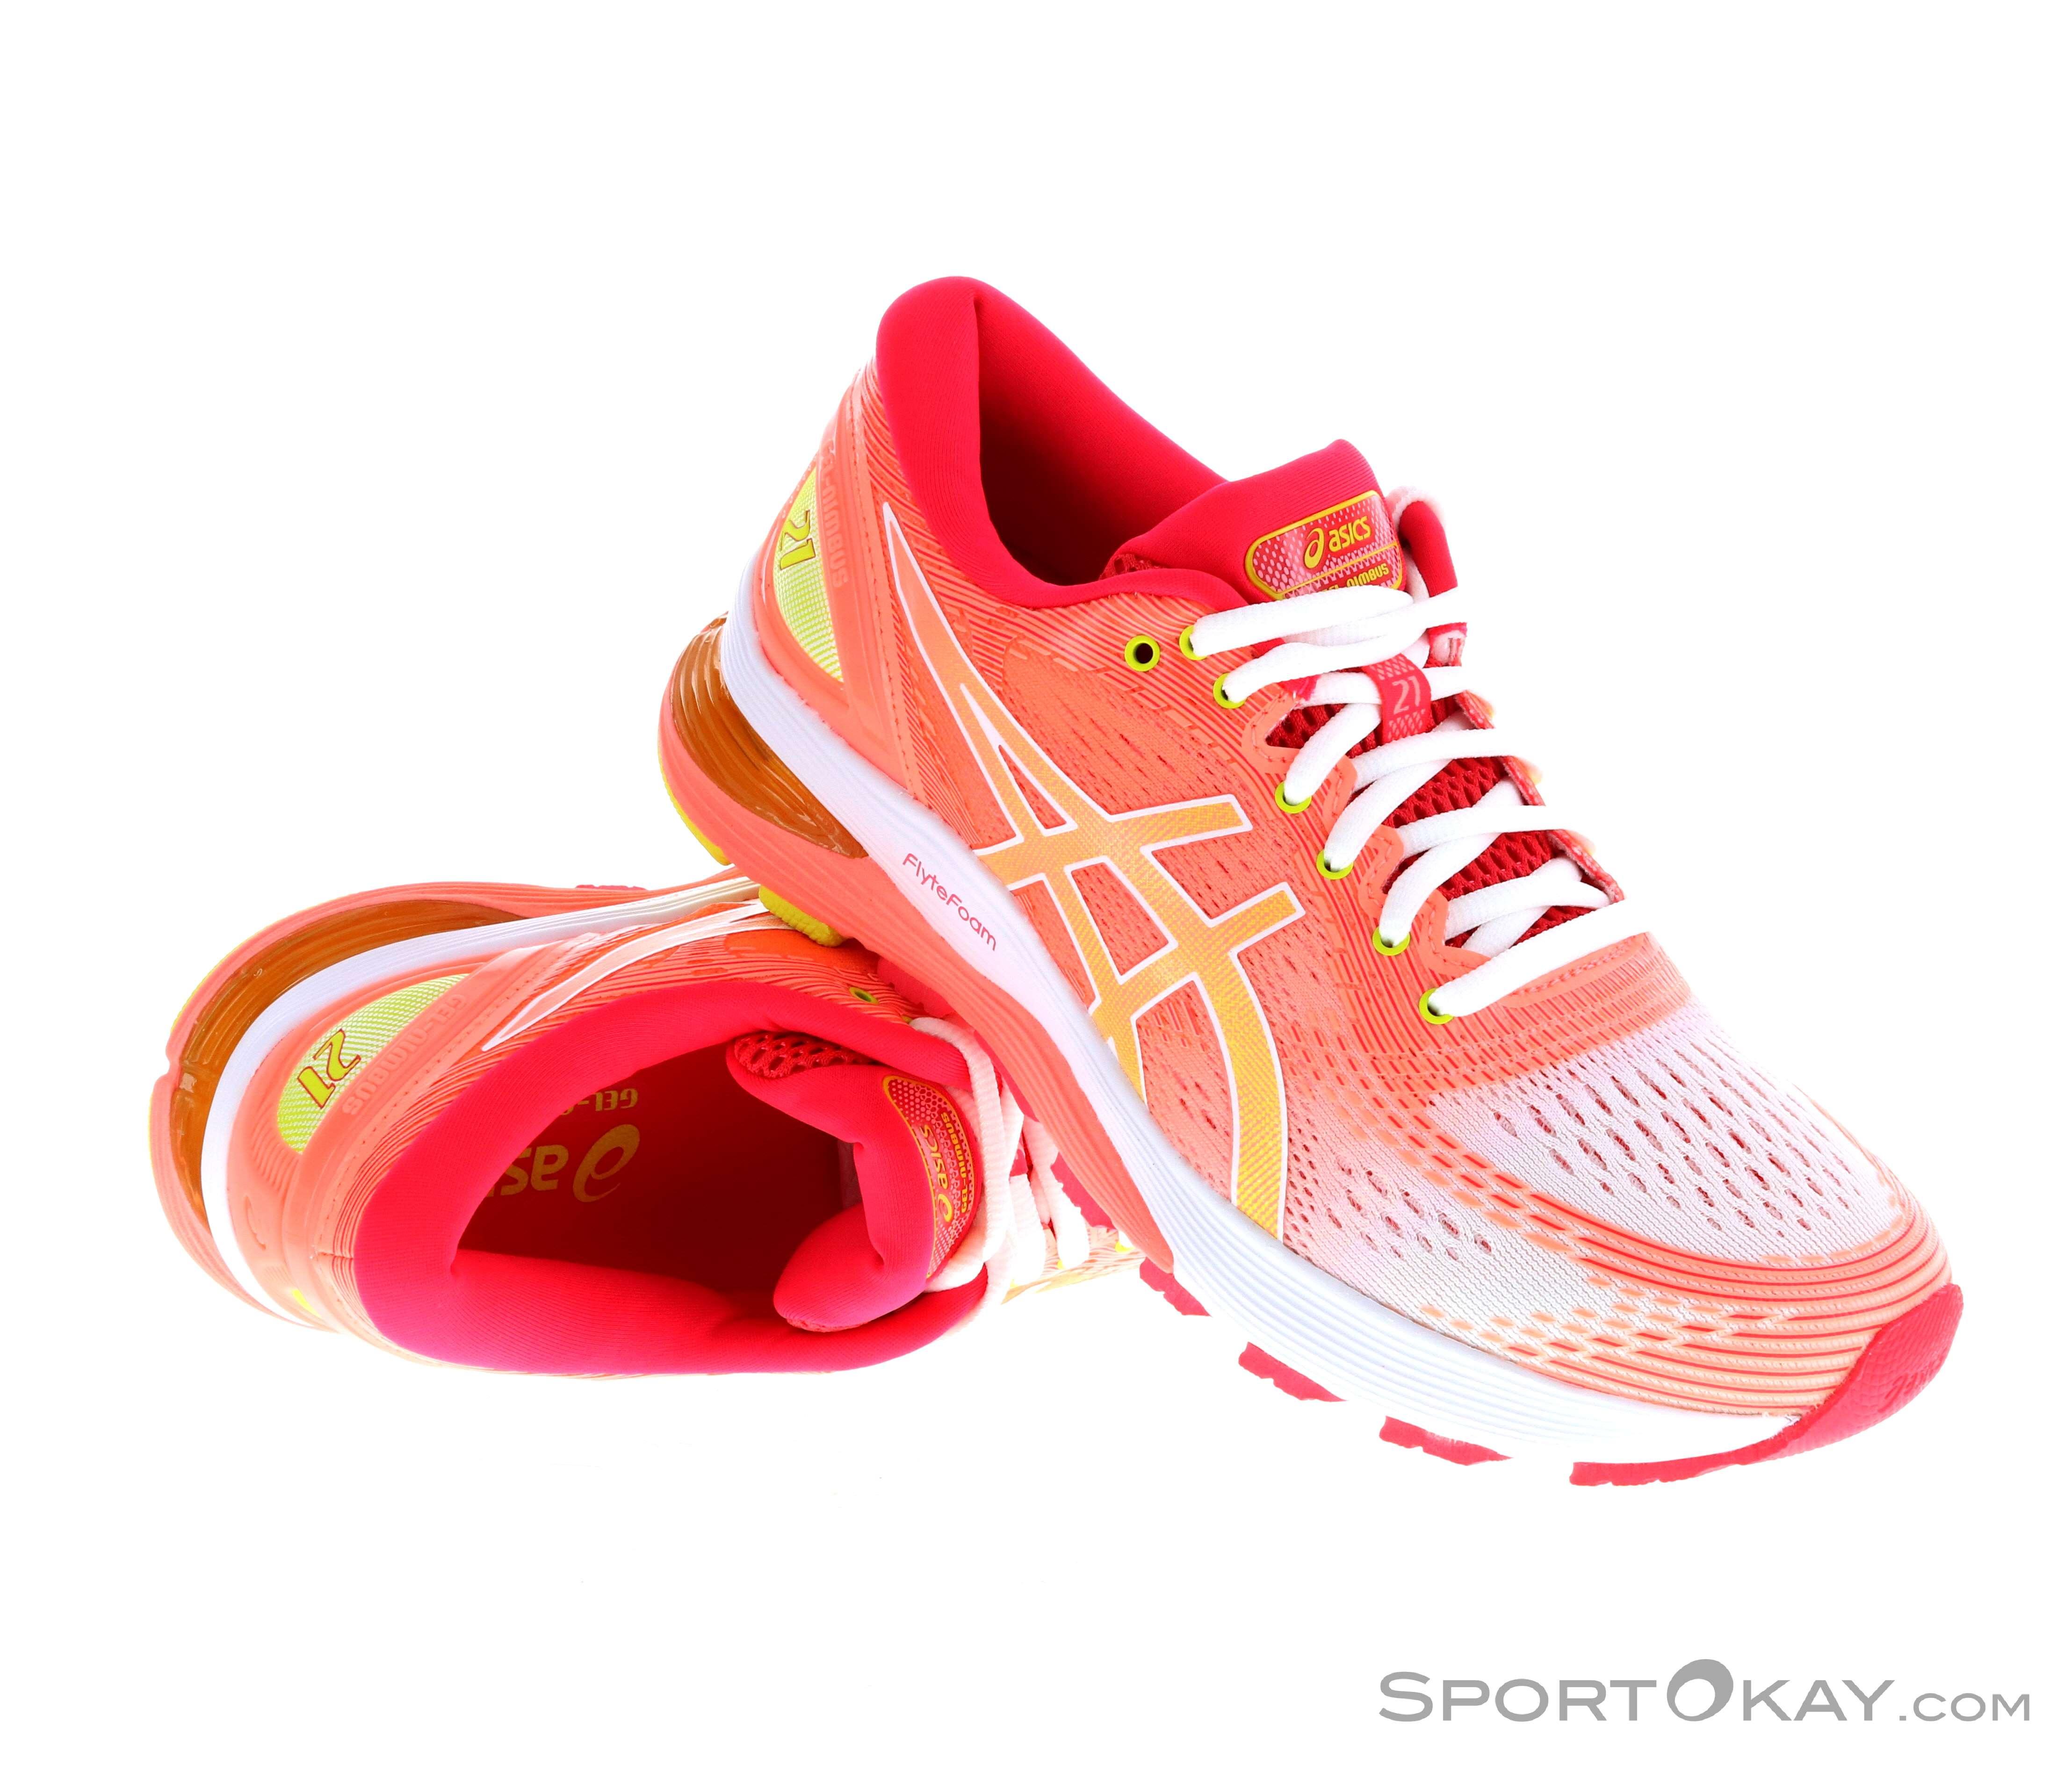 Asics Asics Gel Nimbus 21 Womens Running Shoes